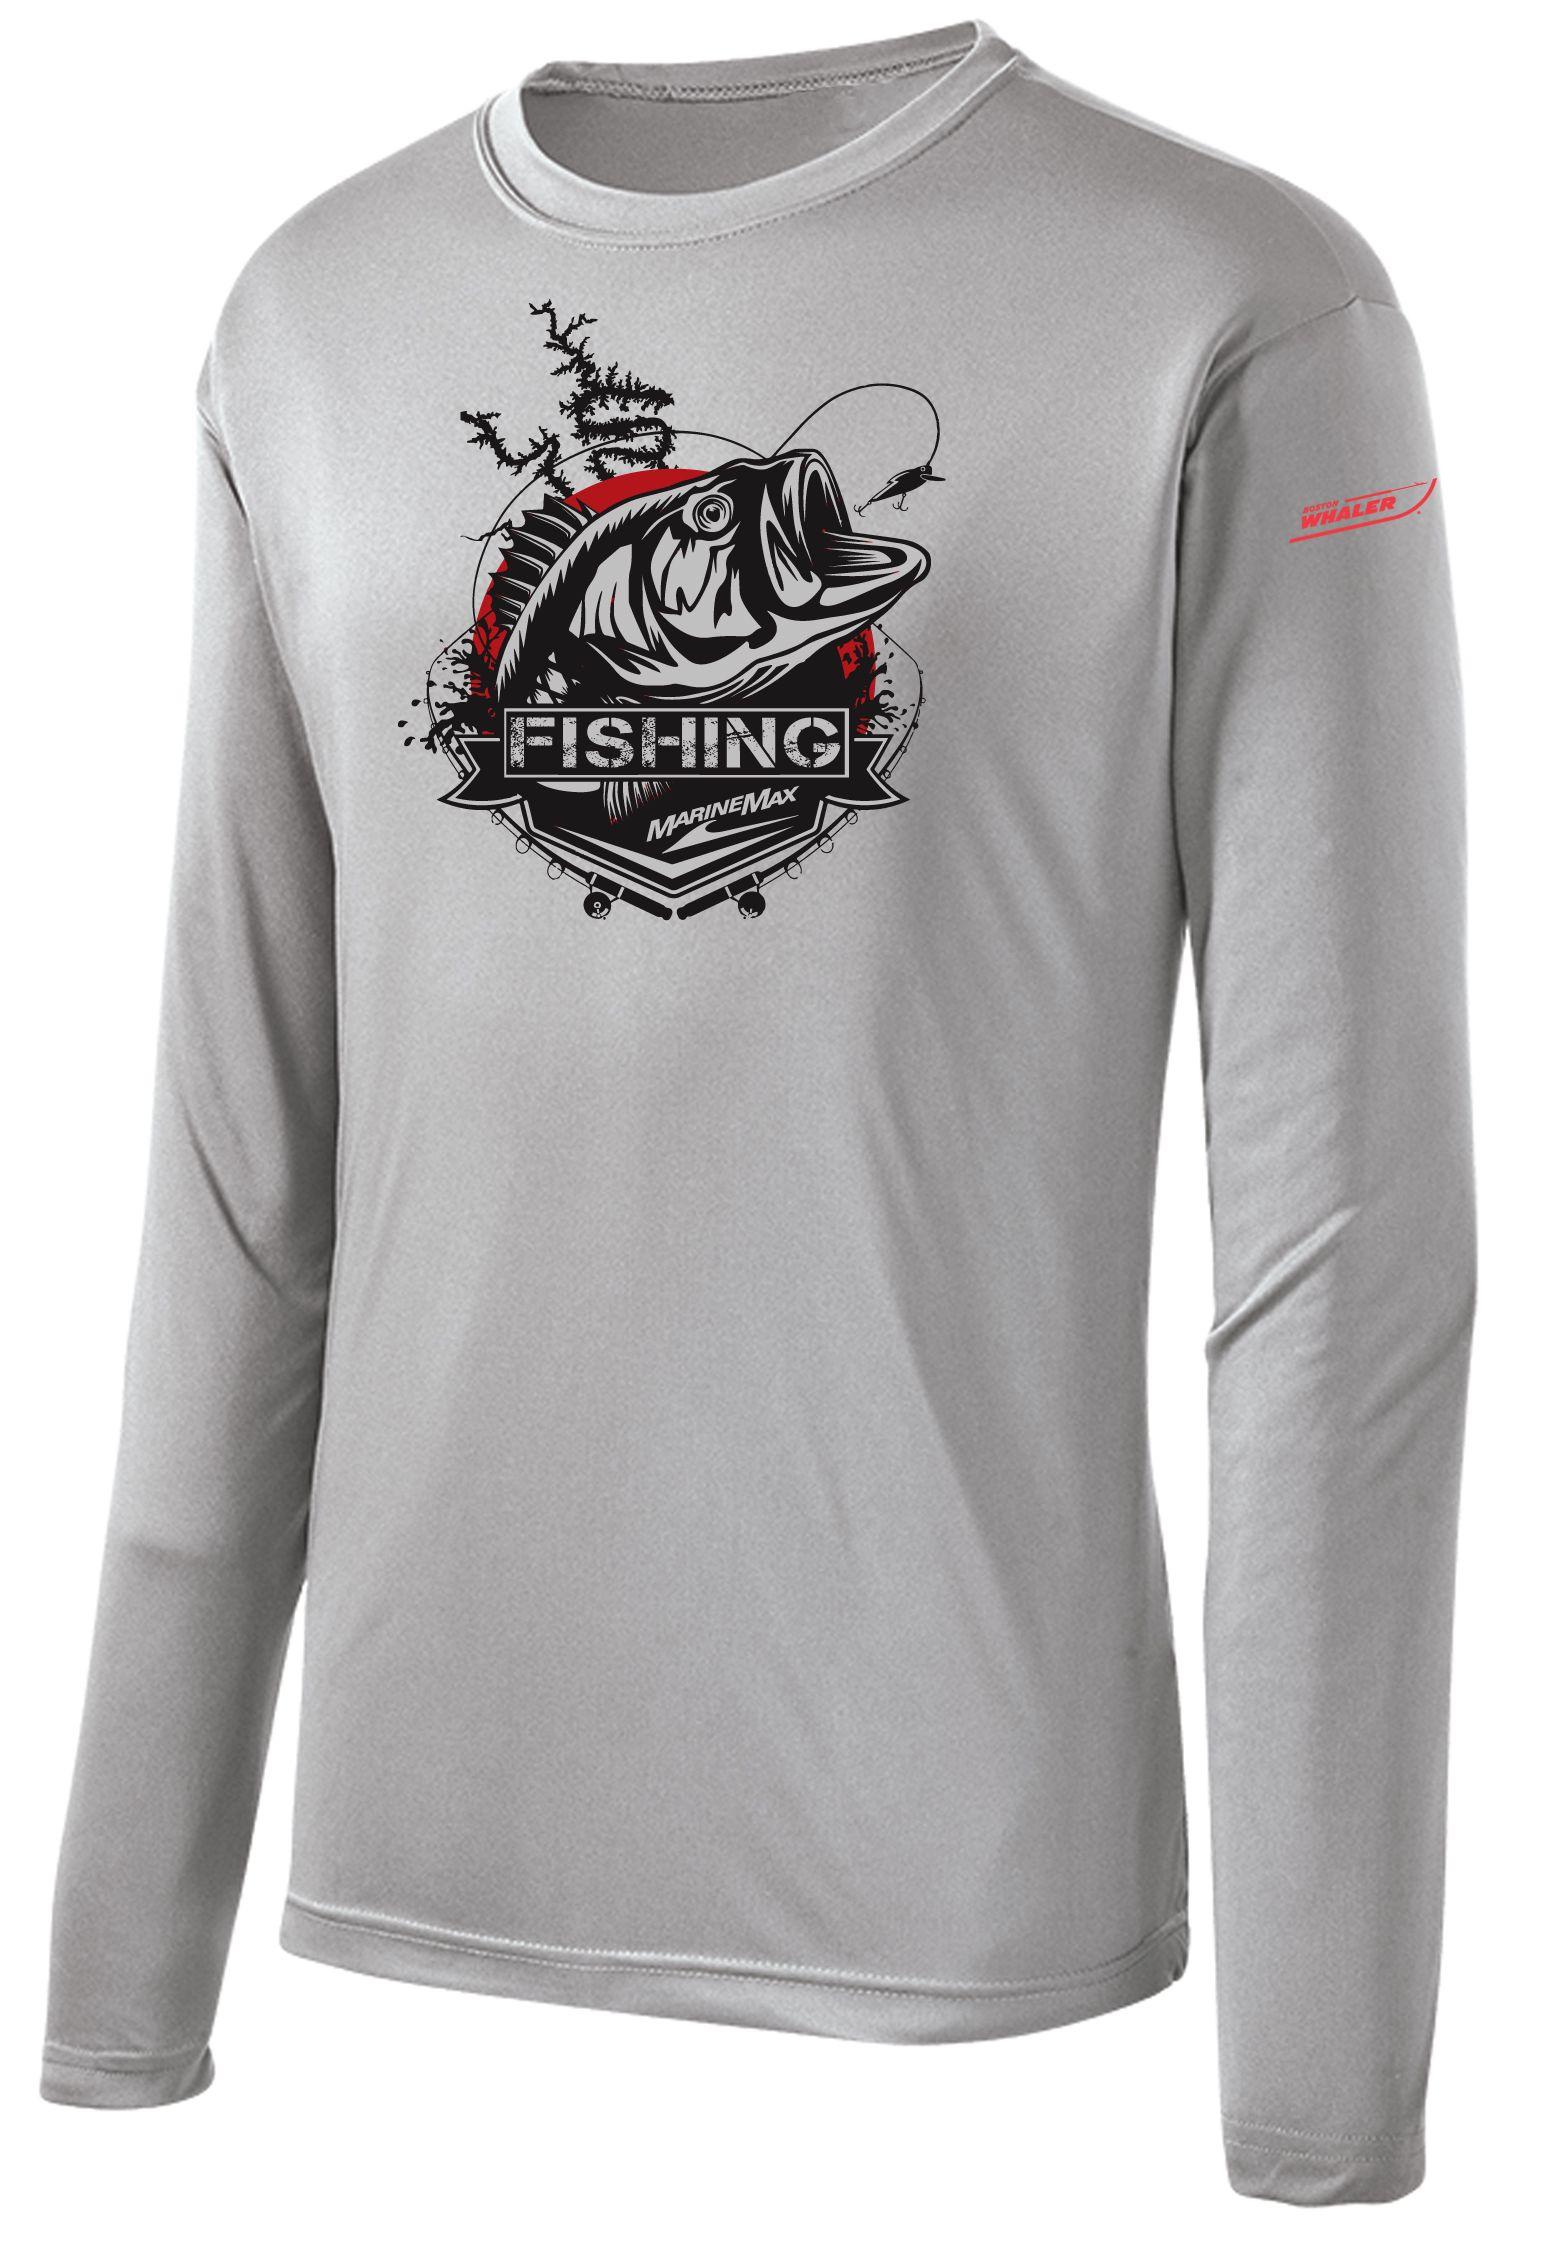 Marinemax Have Their New Custom Dri Fit Fishing Shirts From Www